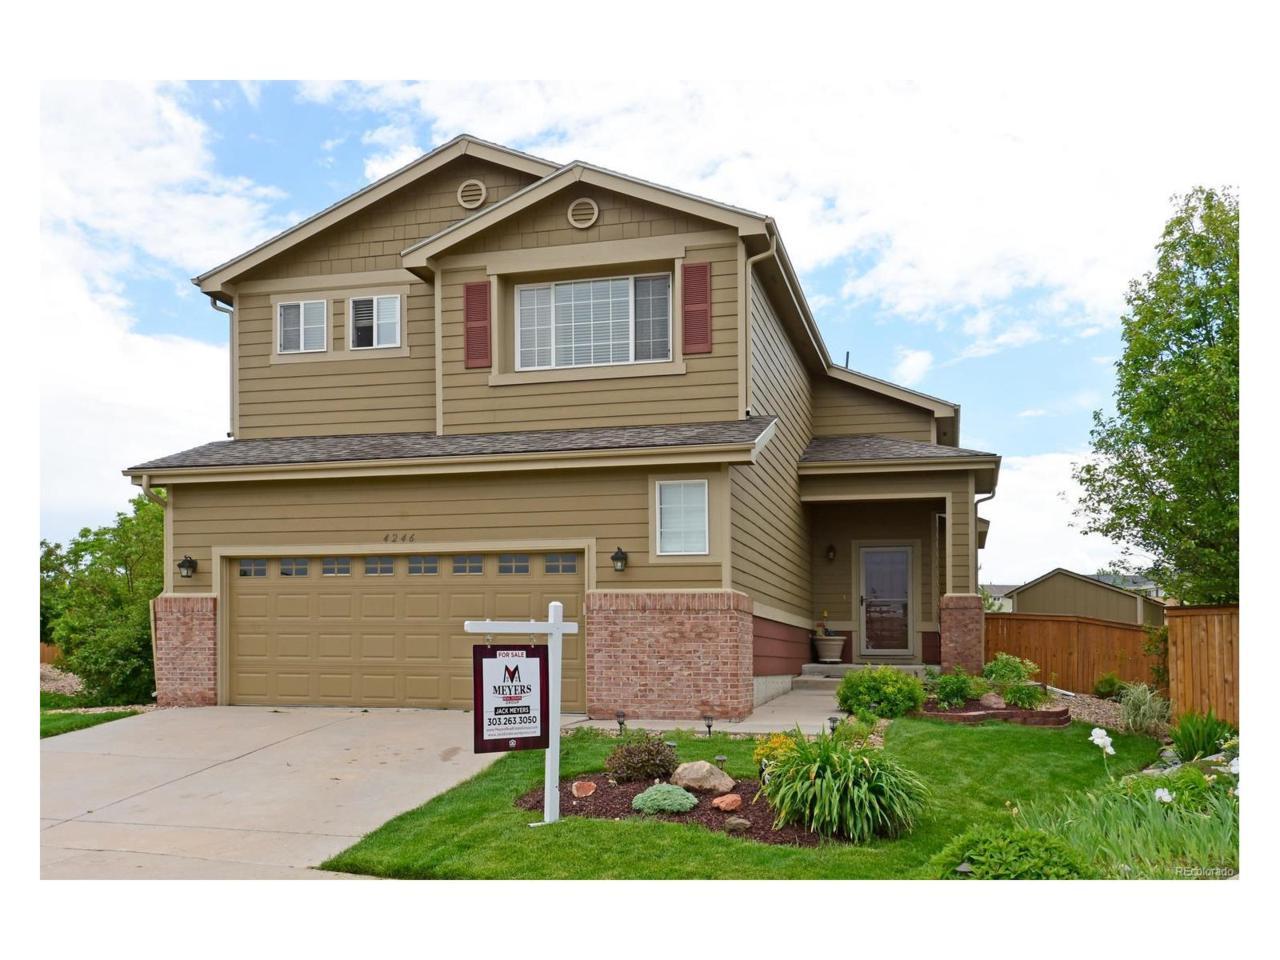 4246 Cherryhurst Court, Highlands Ranch, CO 80126 (MLS #7527603) :: 8z Real Estate